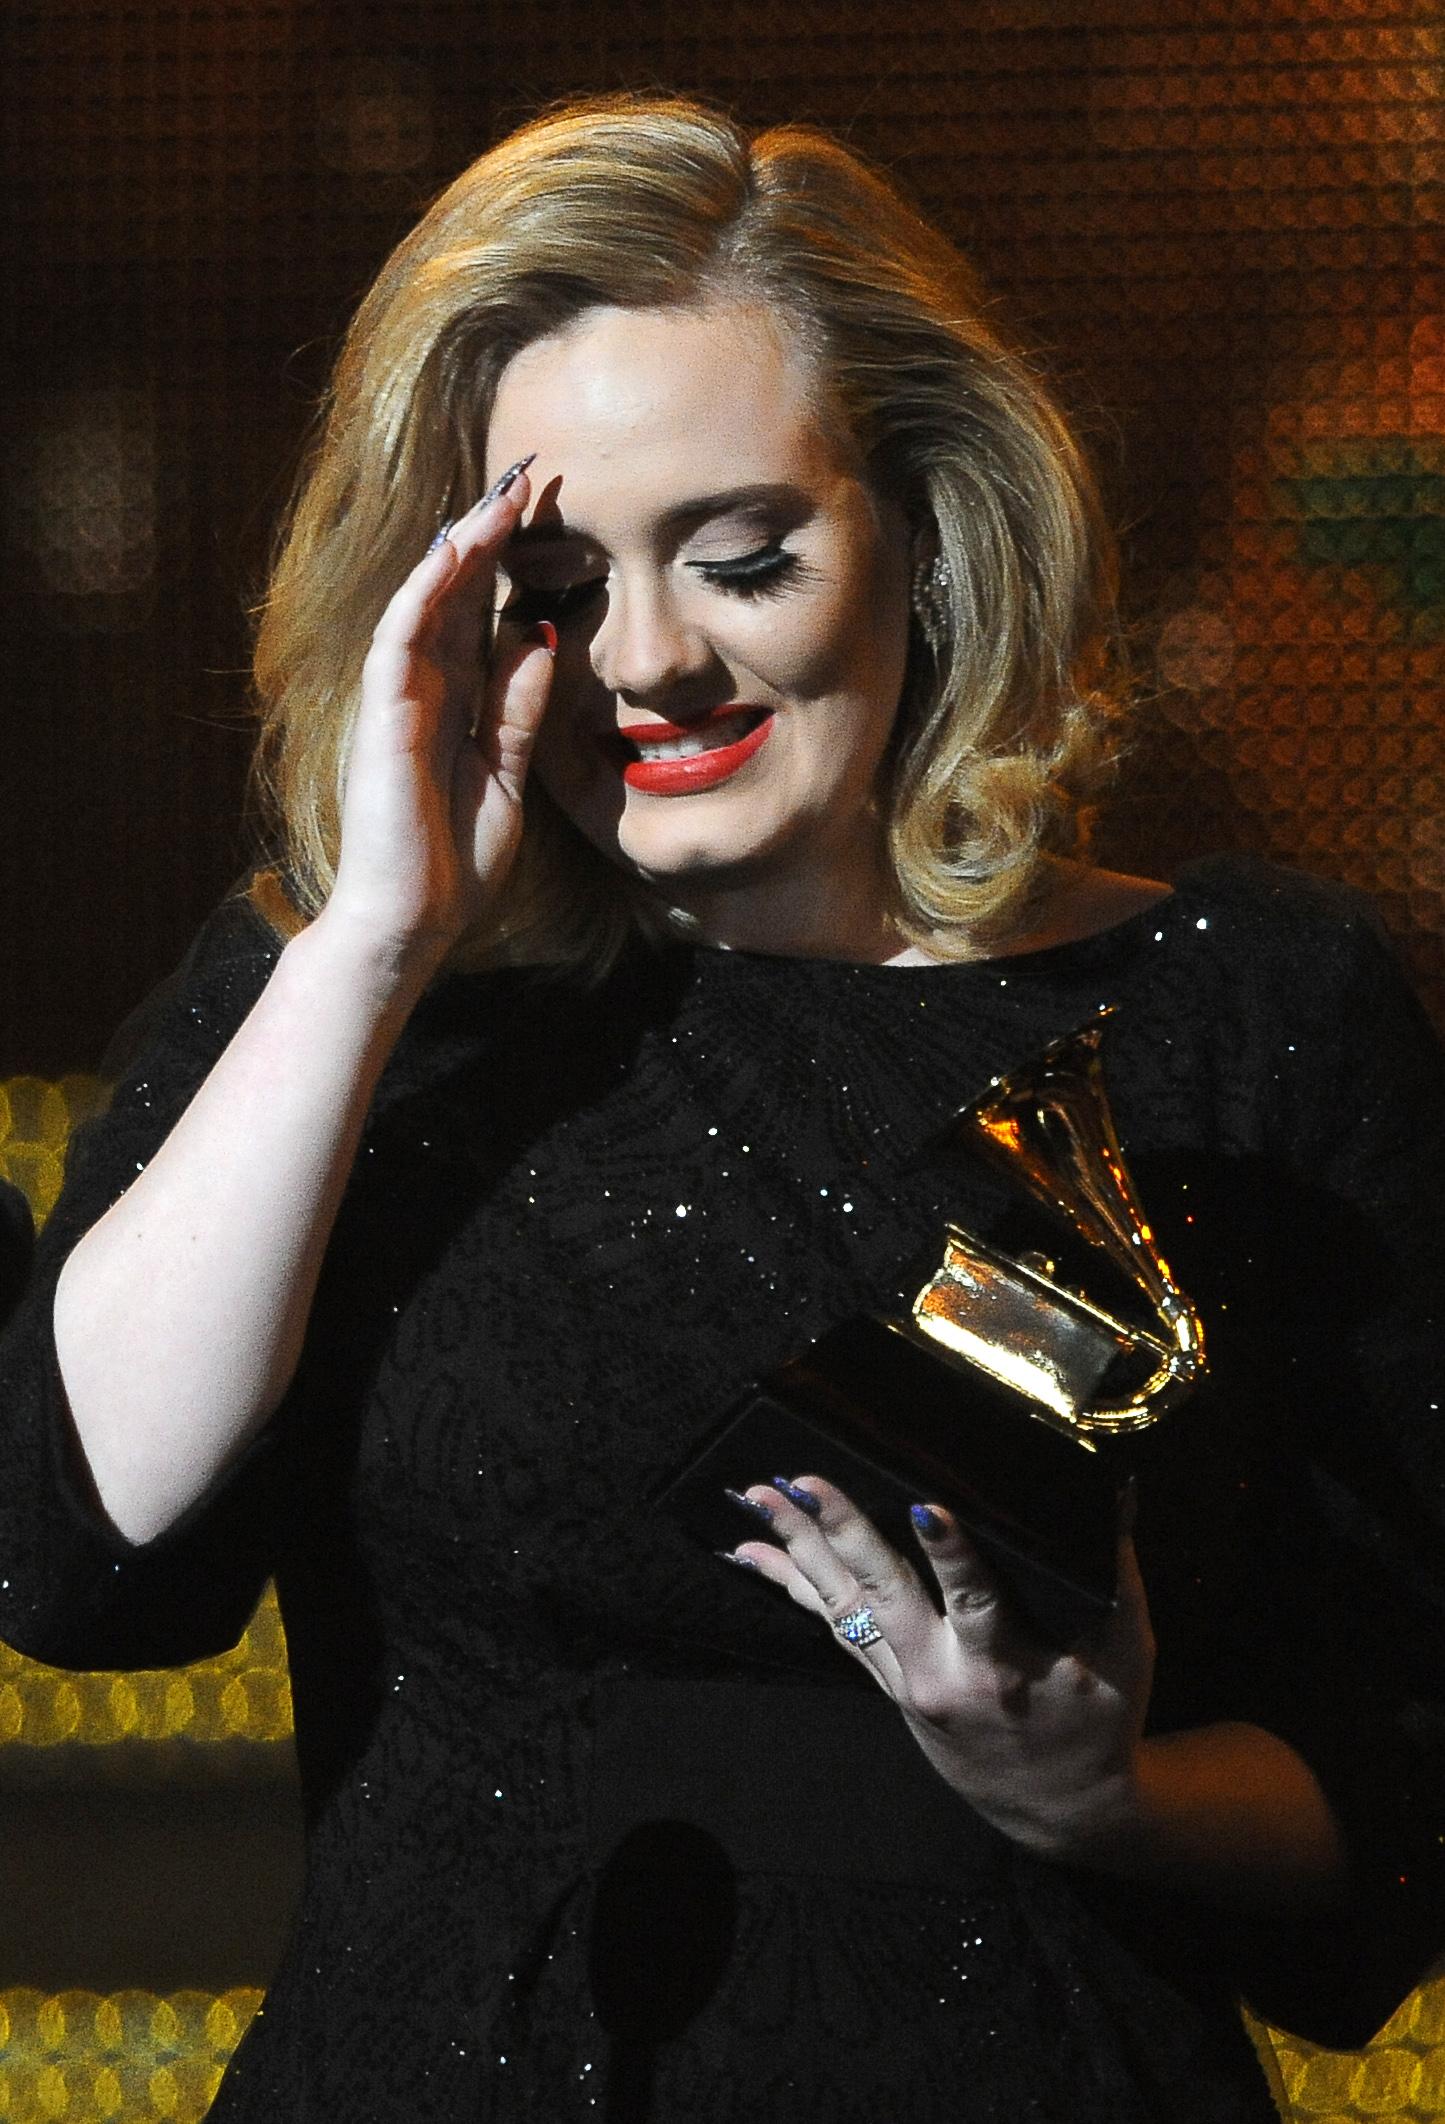 Adele won a Grammy.